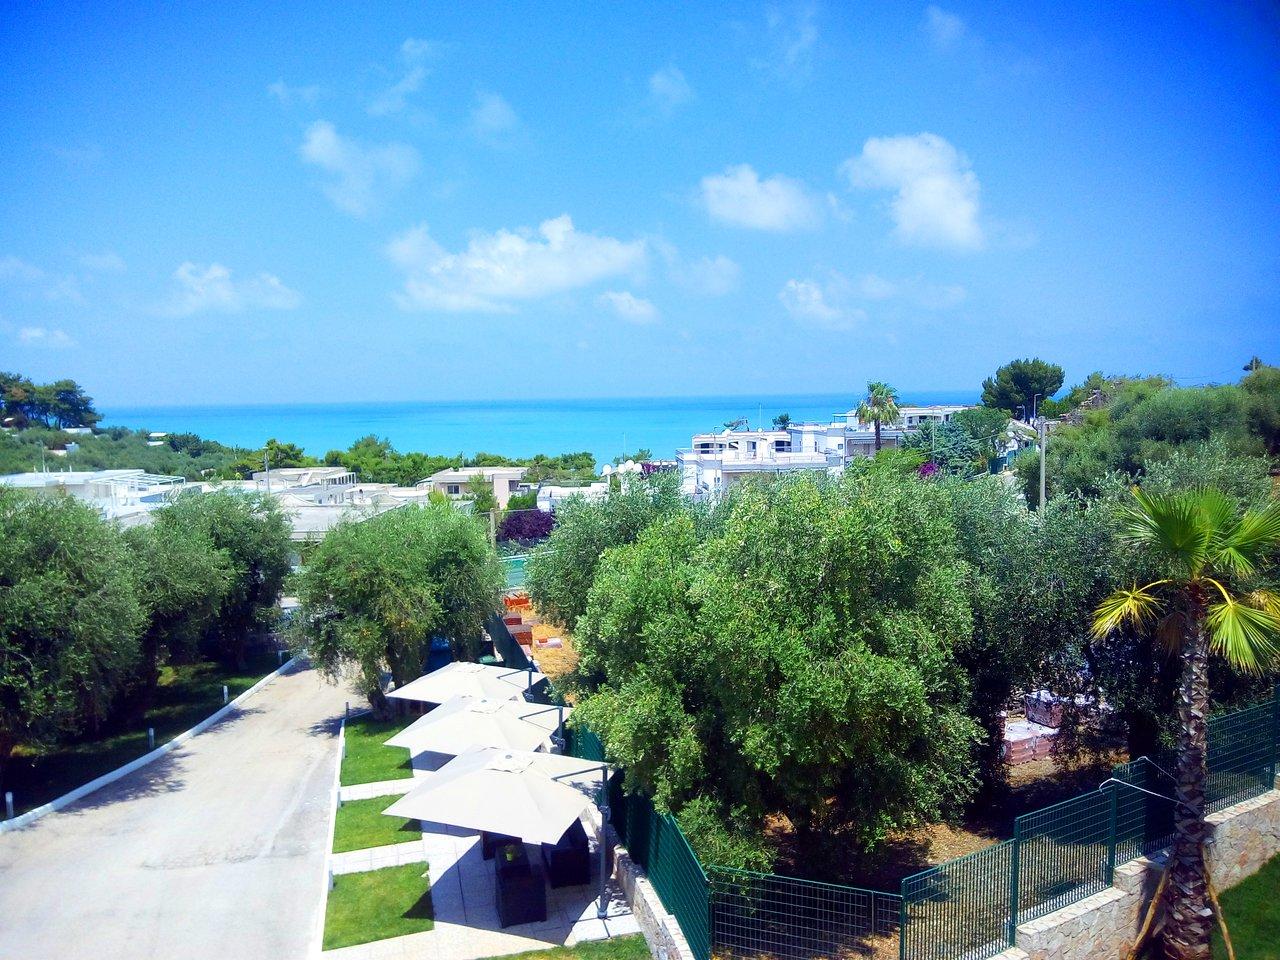 Palestra Vico Del Gargano touring hotel - prices & reviews (rodi garganico, italy